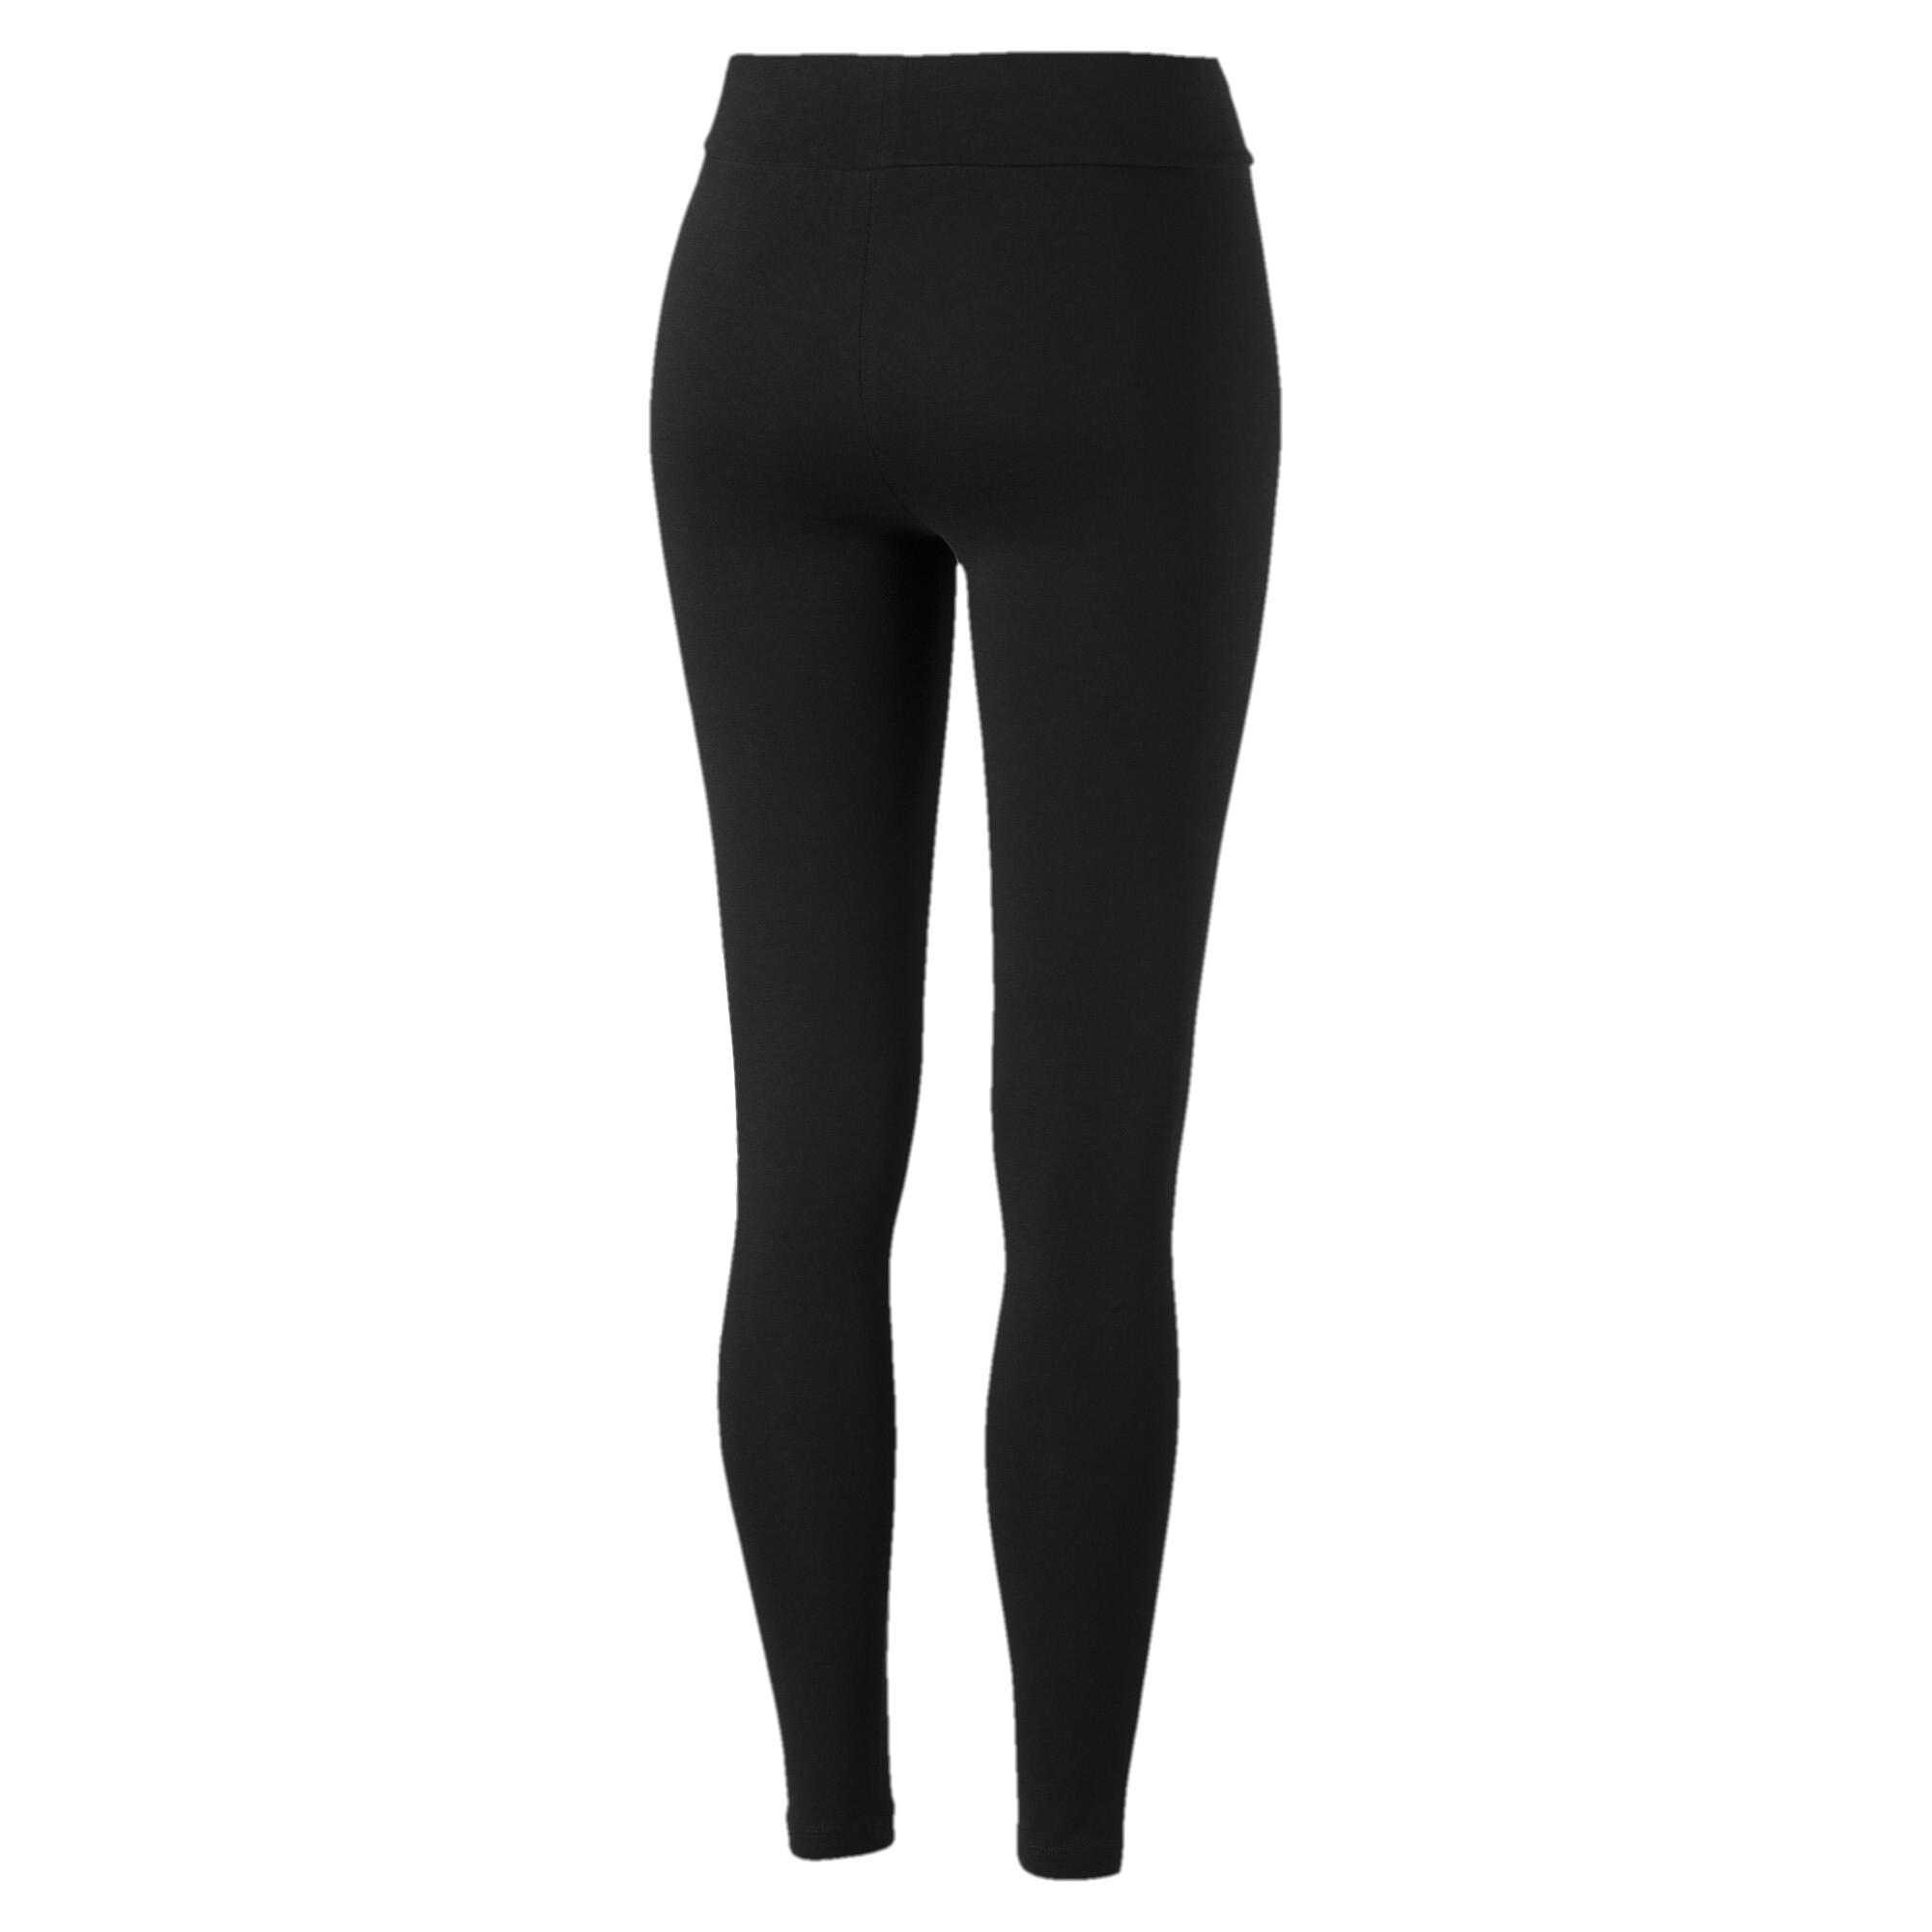 Details zu PUMA Essentials+ Graphic Damen Leggings Frauen Sporthose Basics Neu